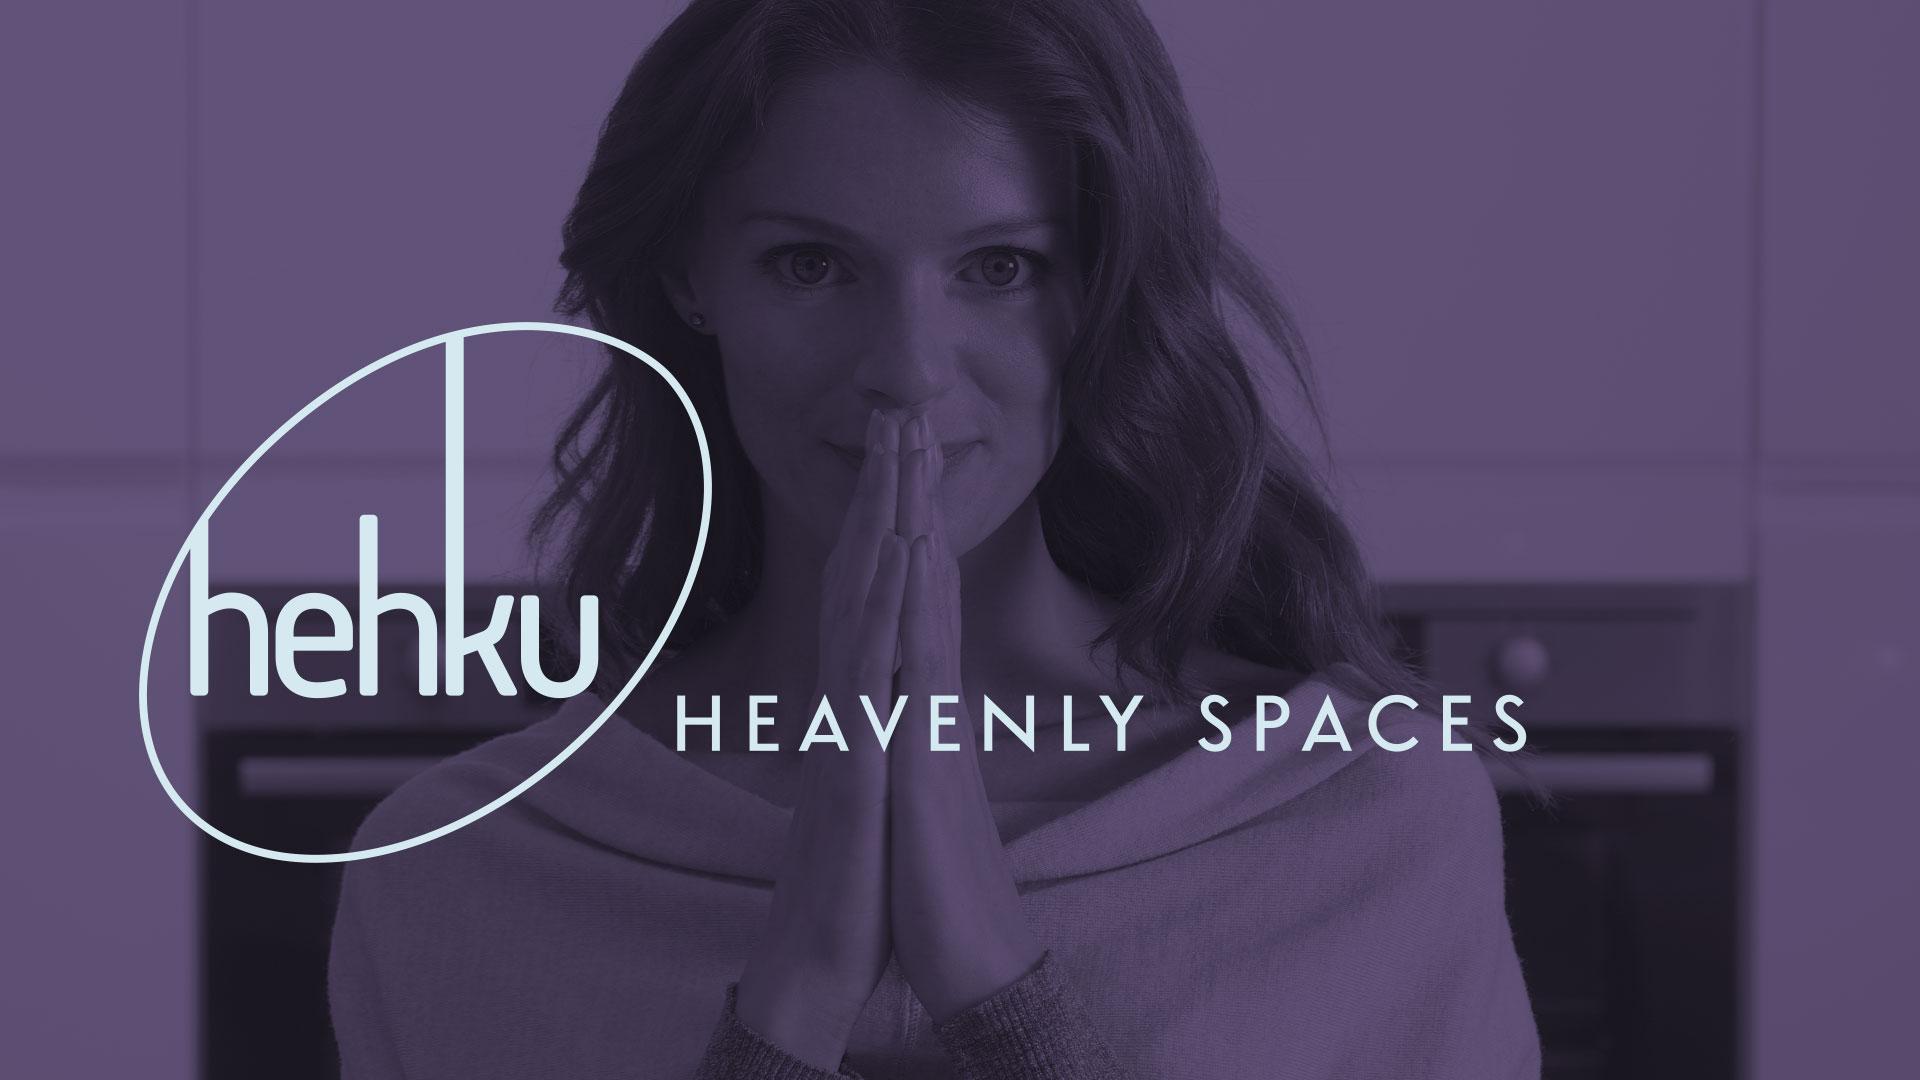 hehku heavenly spaces